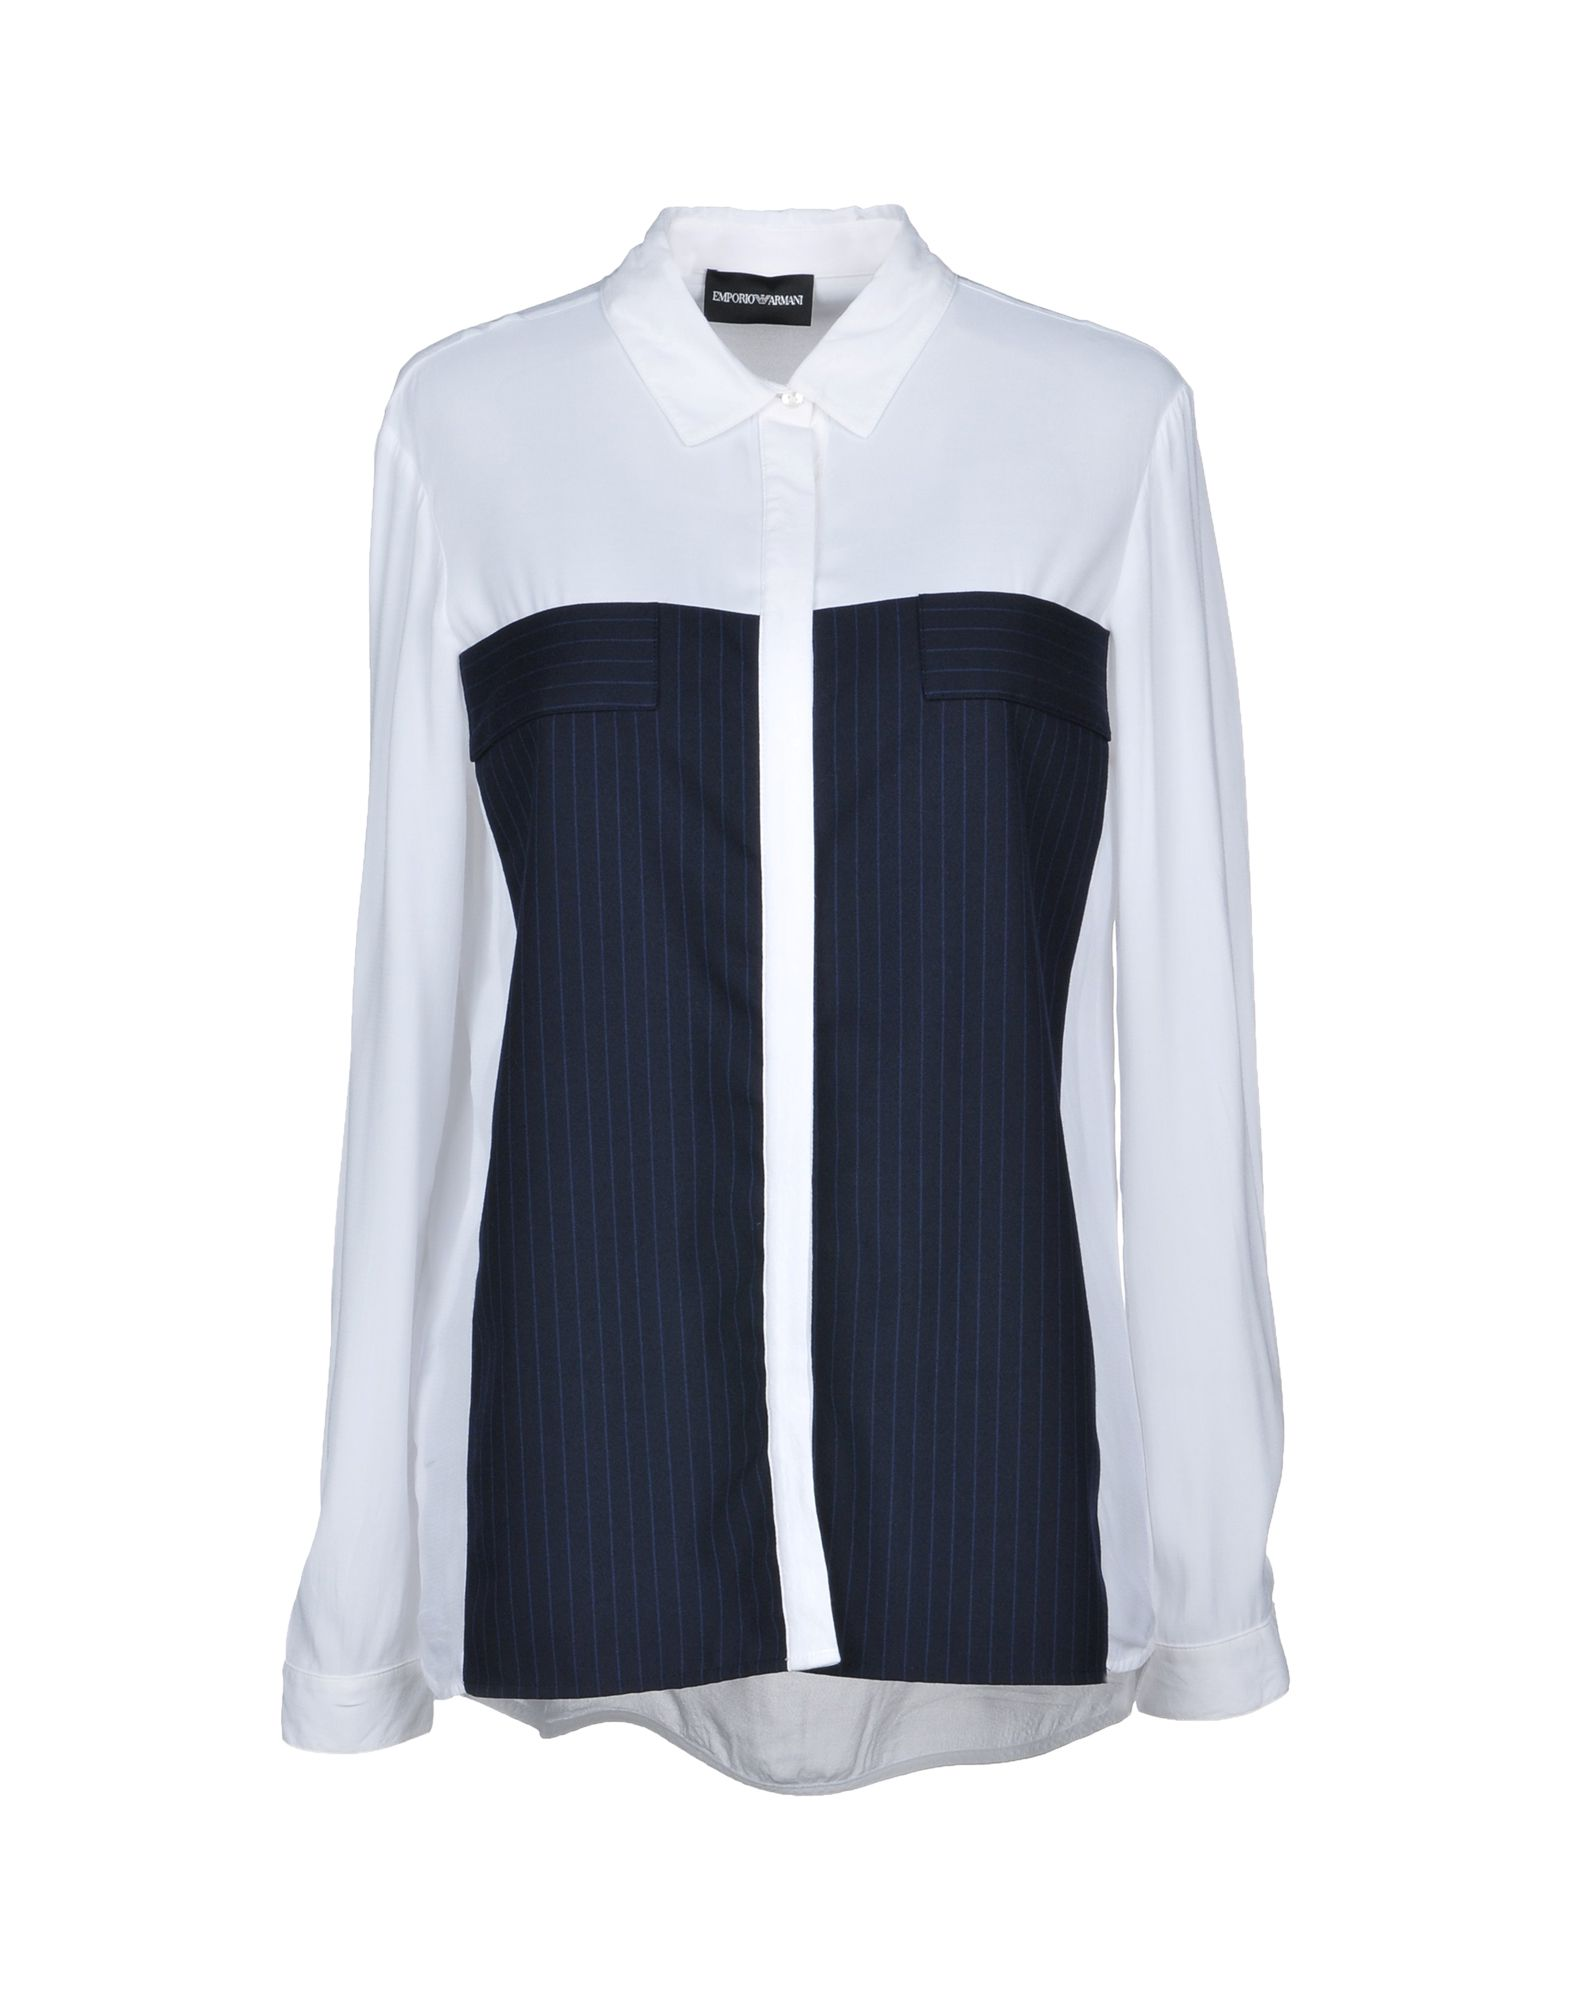 Emporio Armani Women Sale Yoox United States Andrew Smith Floral Printed Shirt Navy Xxl